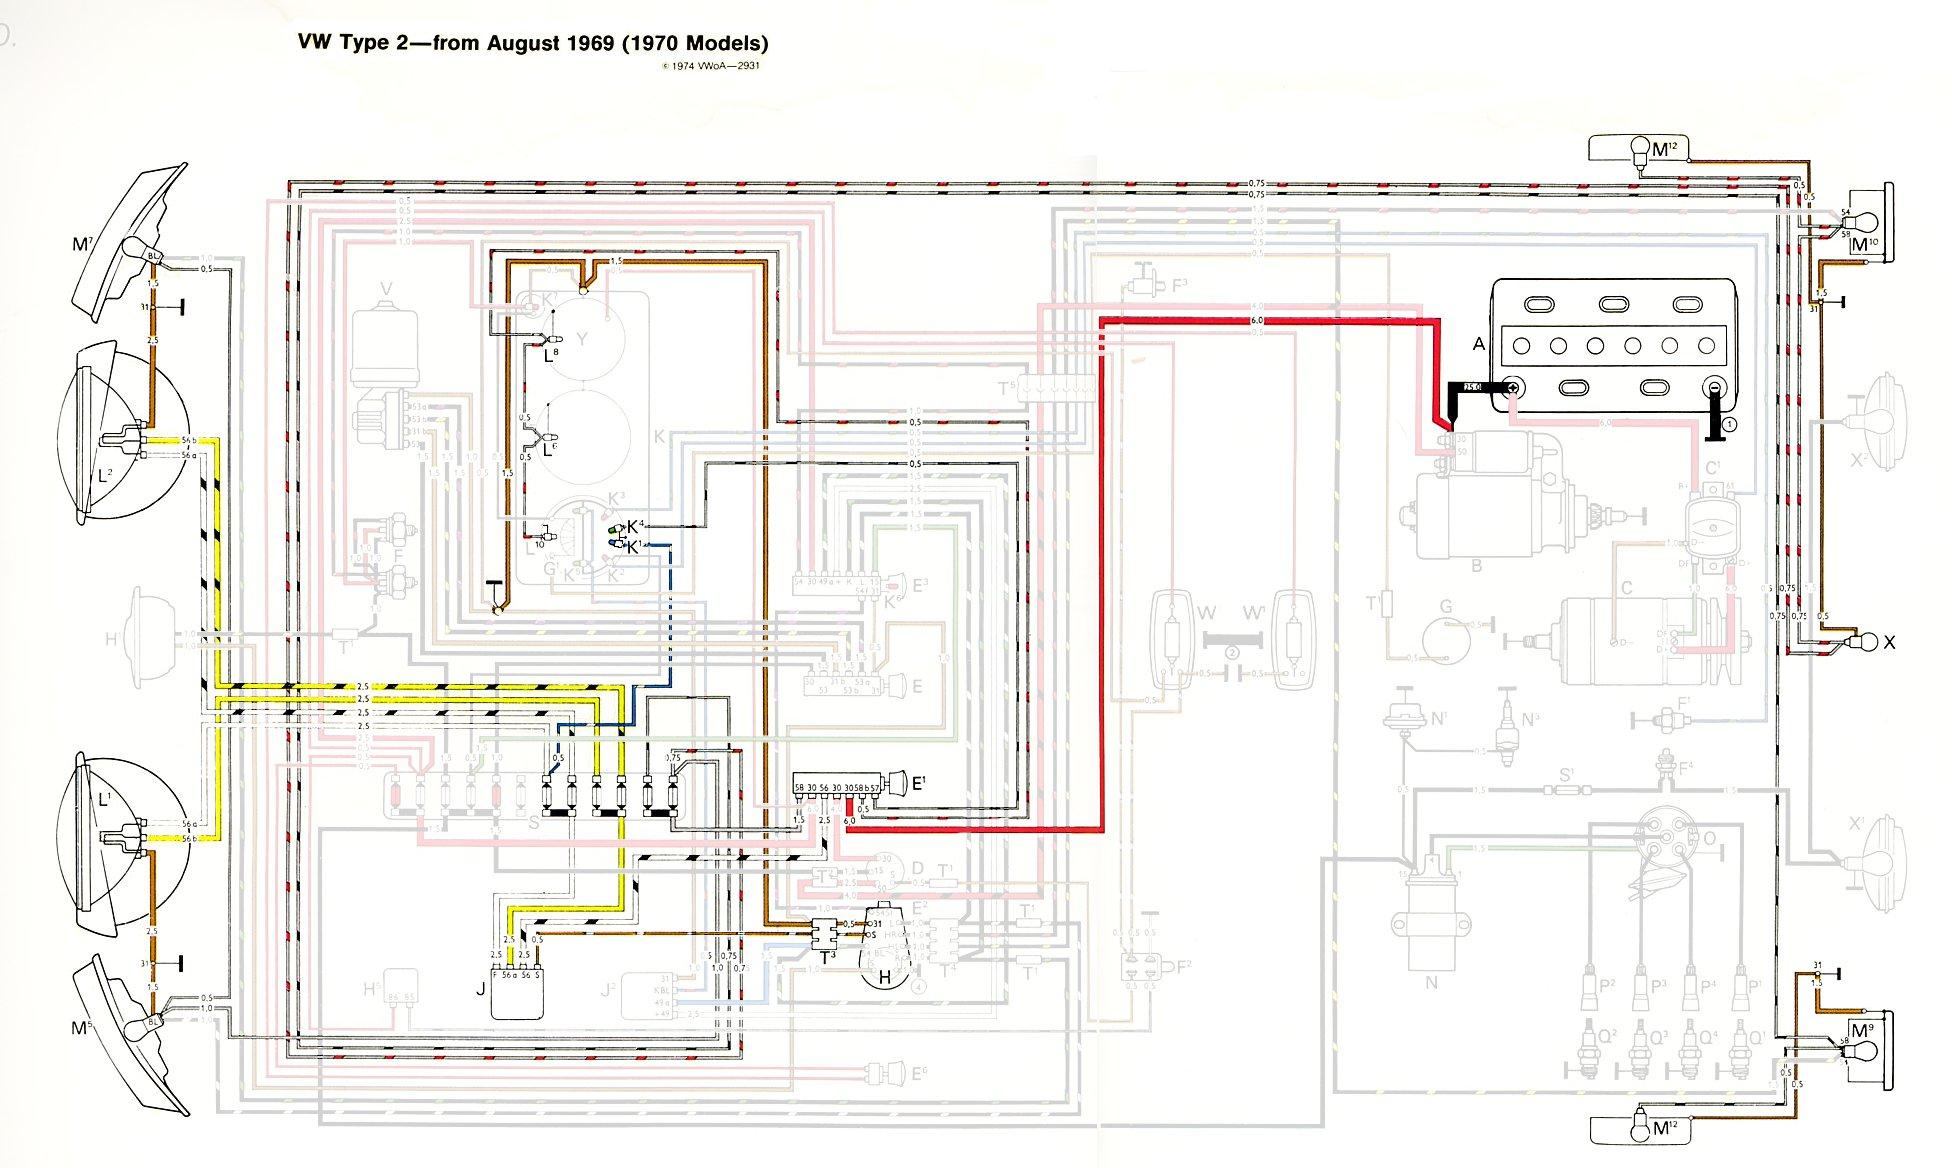 1973 Ford Truck Radio Wire Diagram Thesamba Com Type 2 Wiring Diagrams